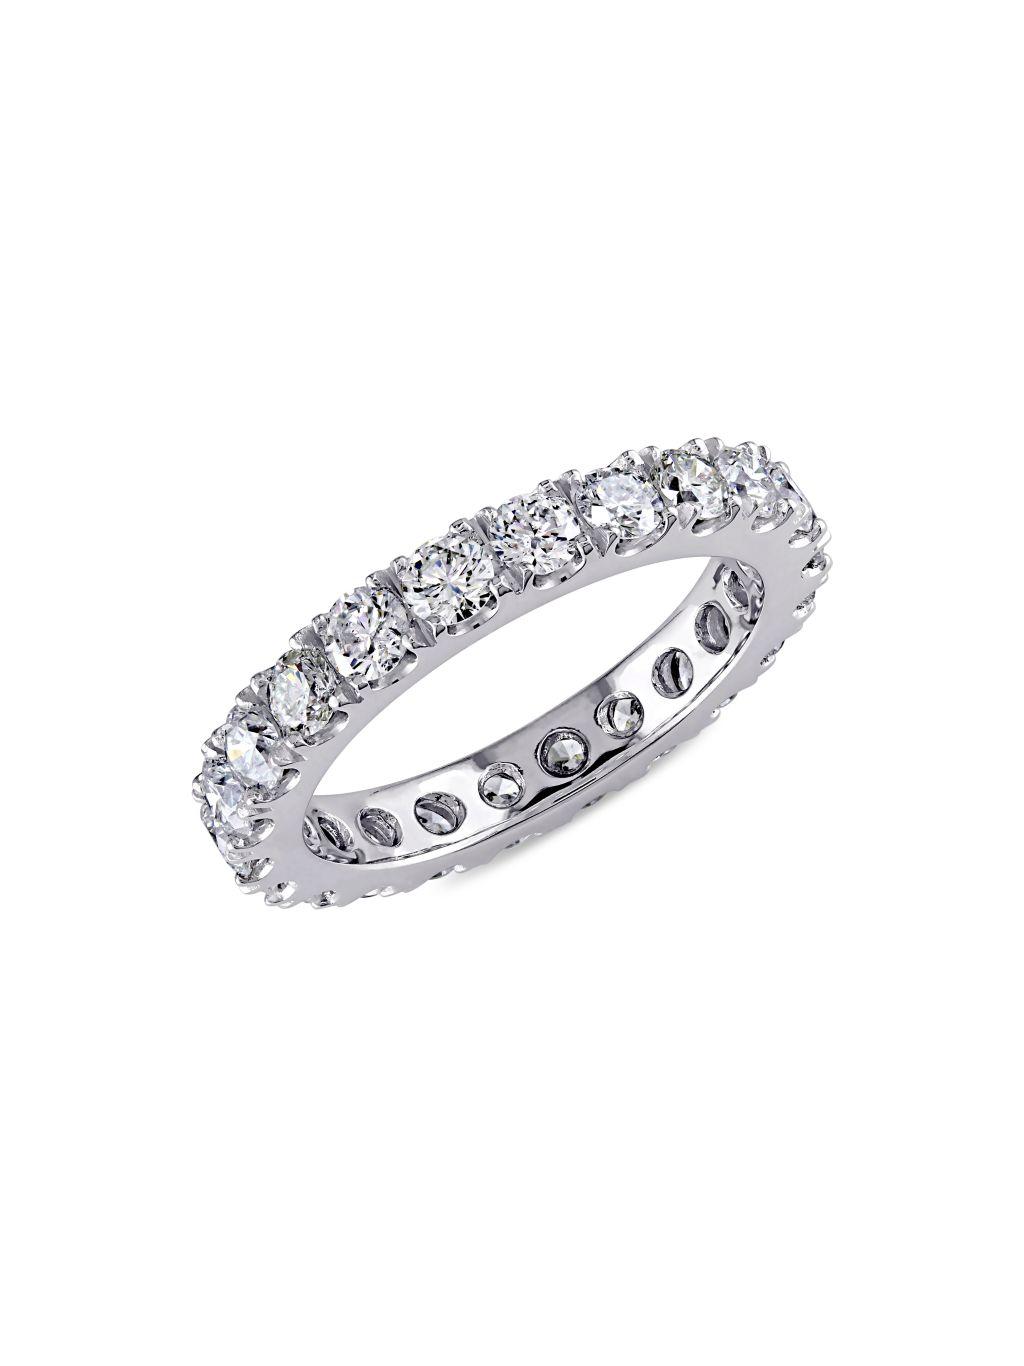 Saks Fifth Avenue 14K White Gold & Diamond Eternity Ring